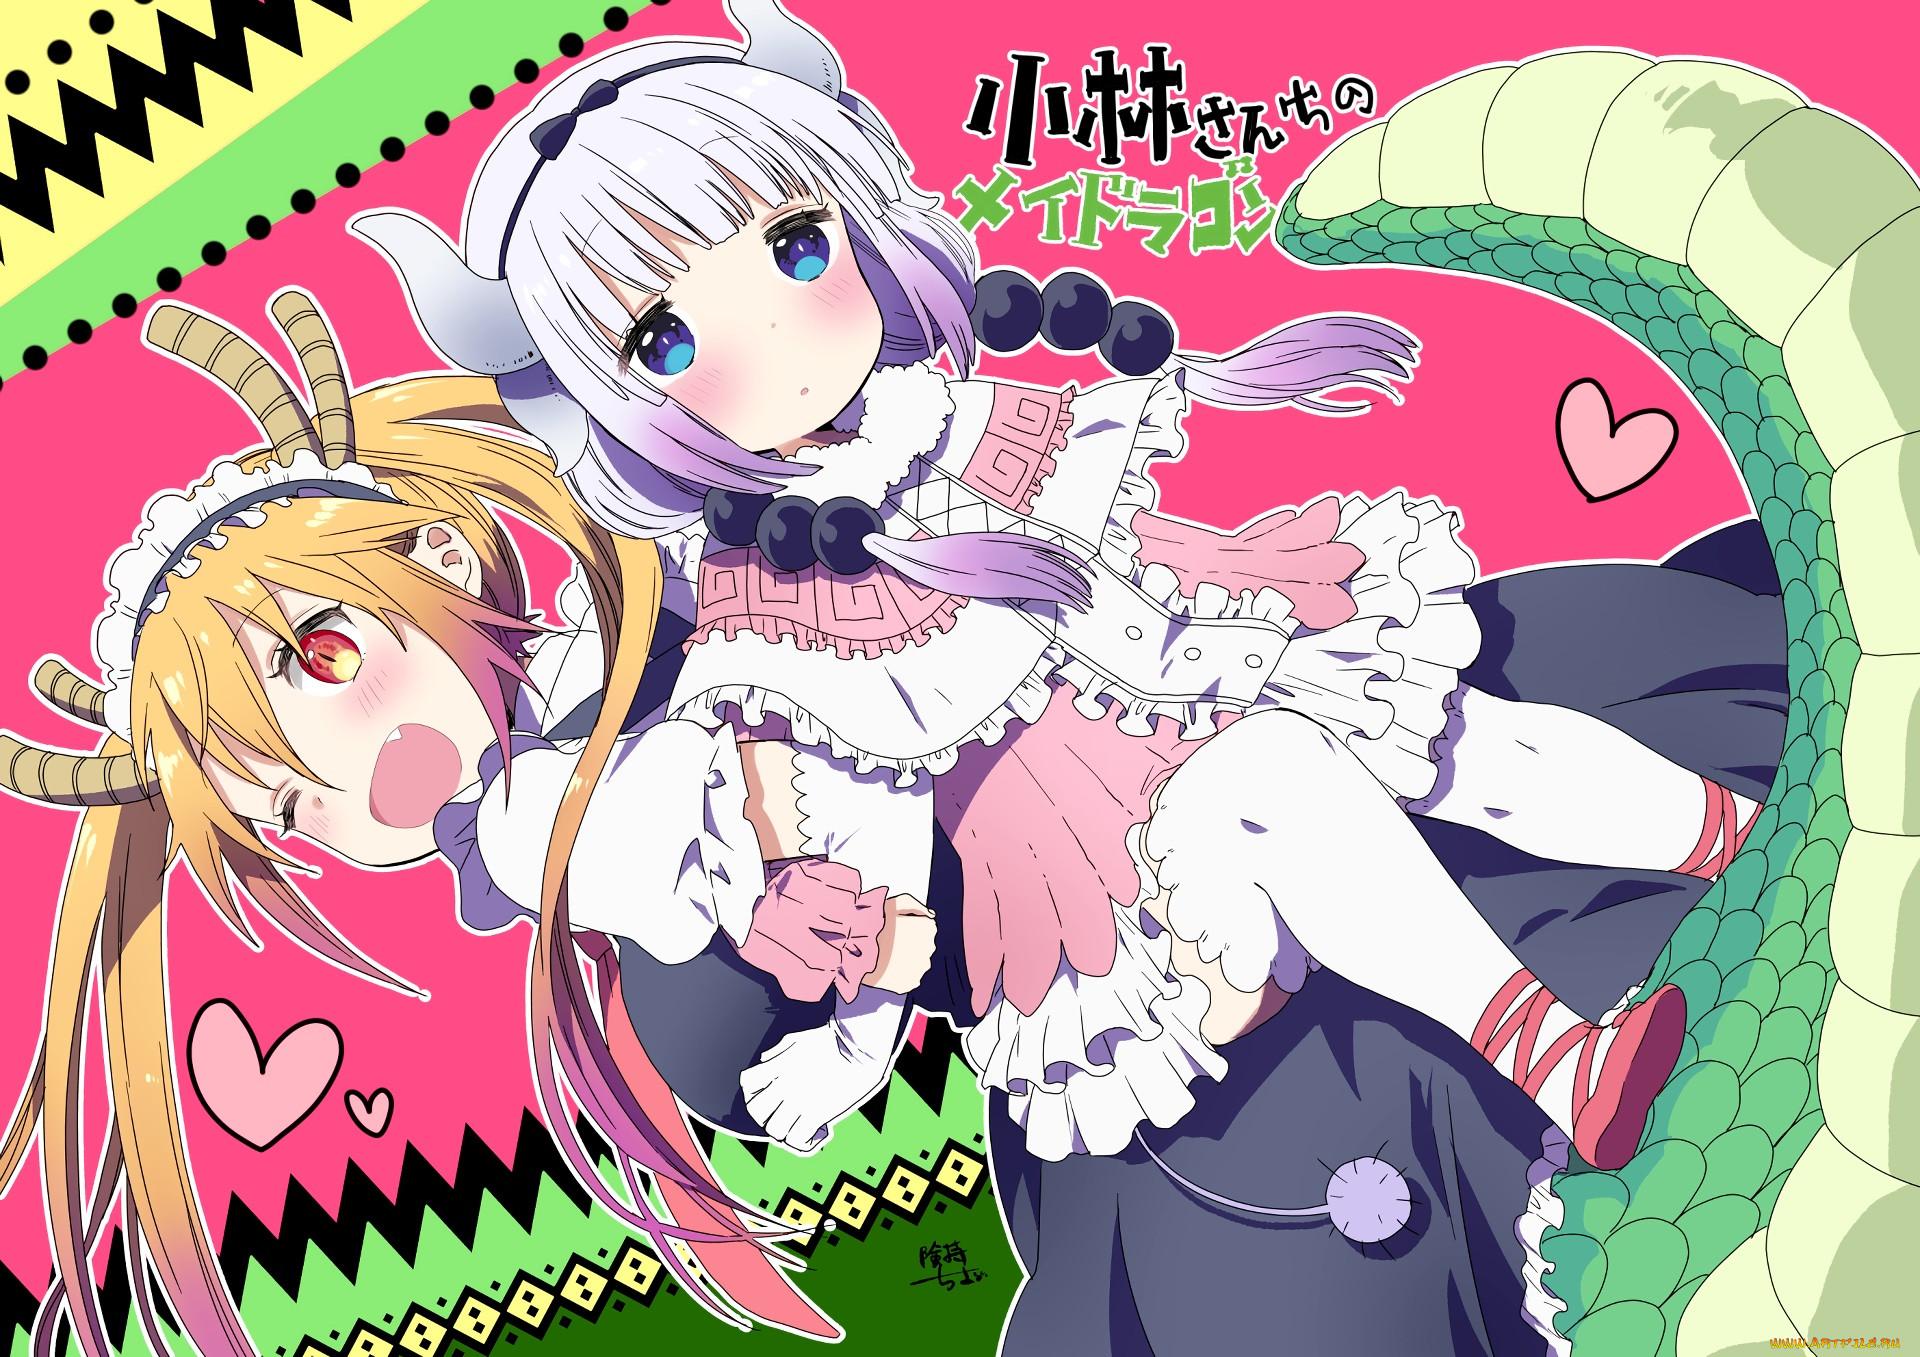 аниме, miss kobayashi`s dragon maid, девушки, взгляд, фон